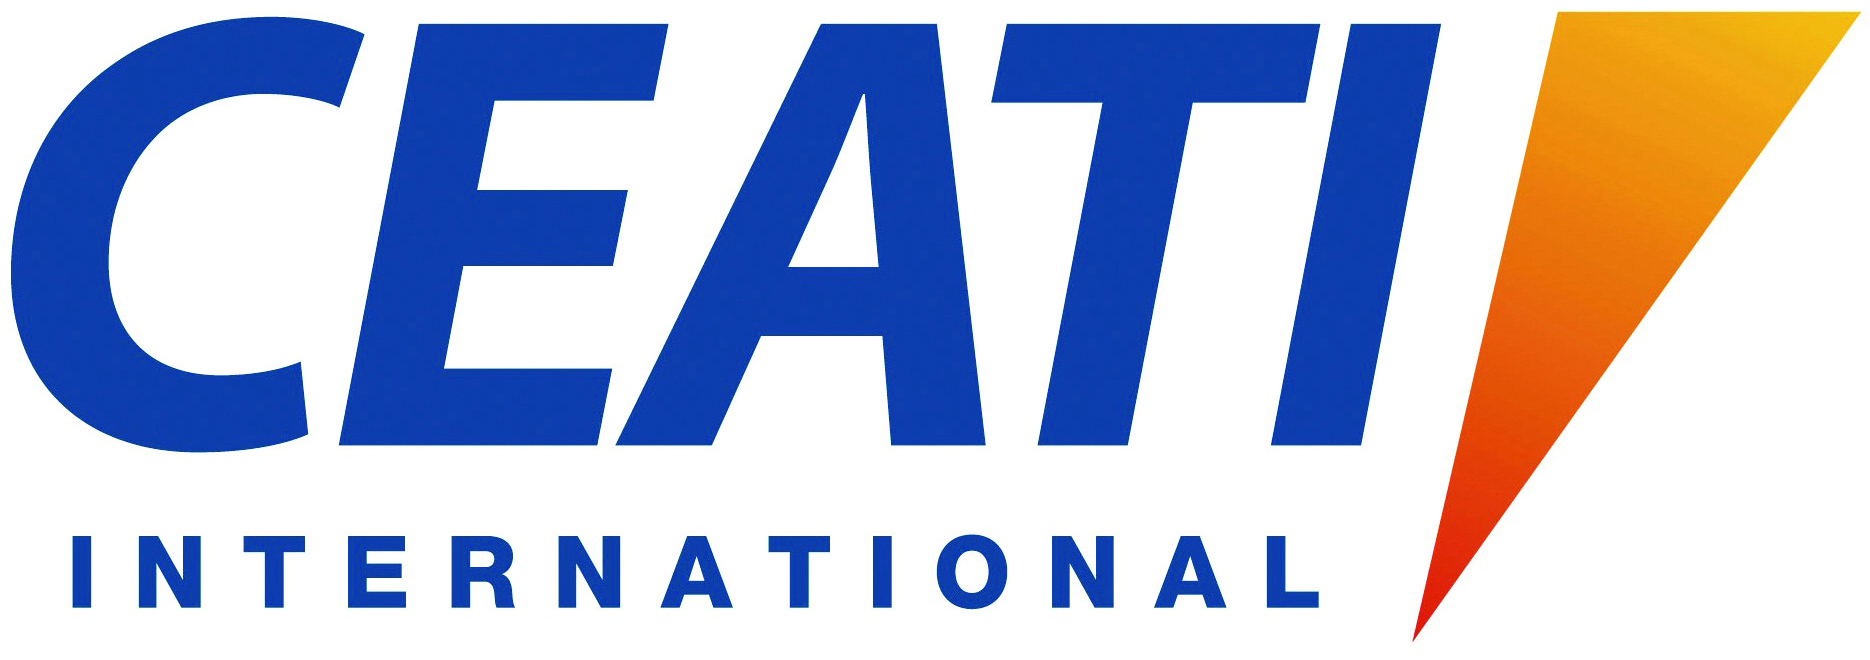 CEATI_International sml.jpg